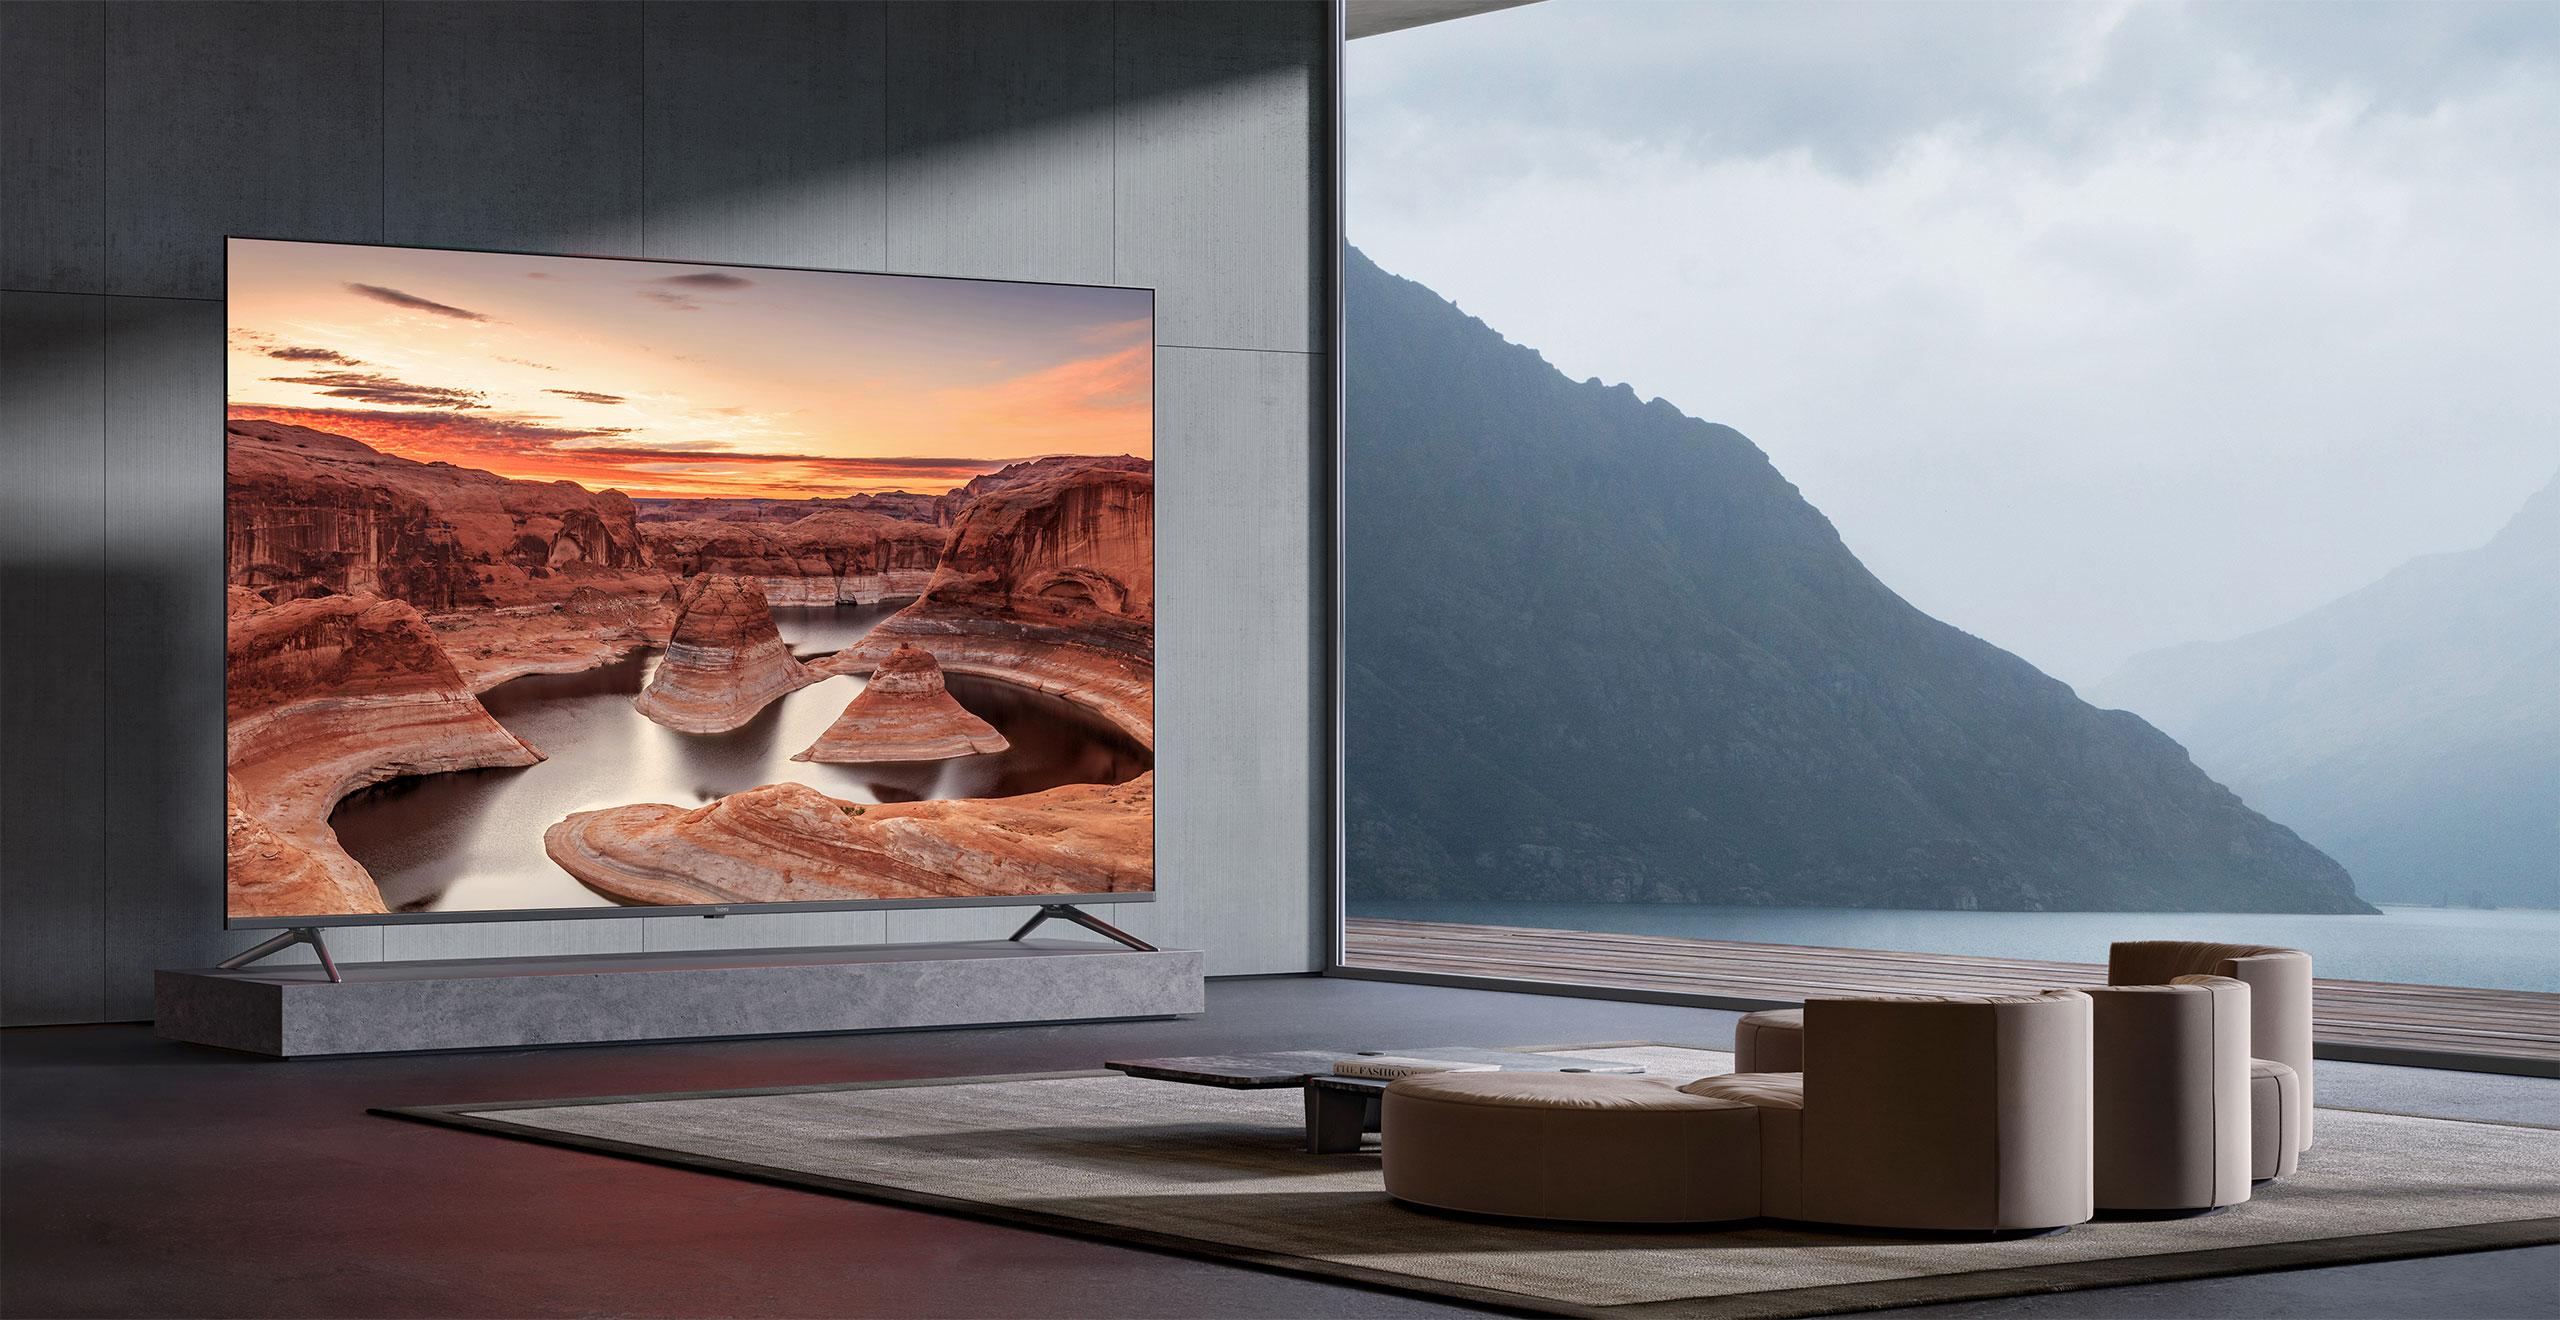 telewizor Redmi MAX 86 Smart TV